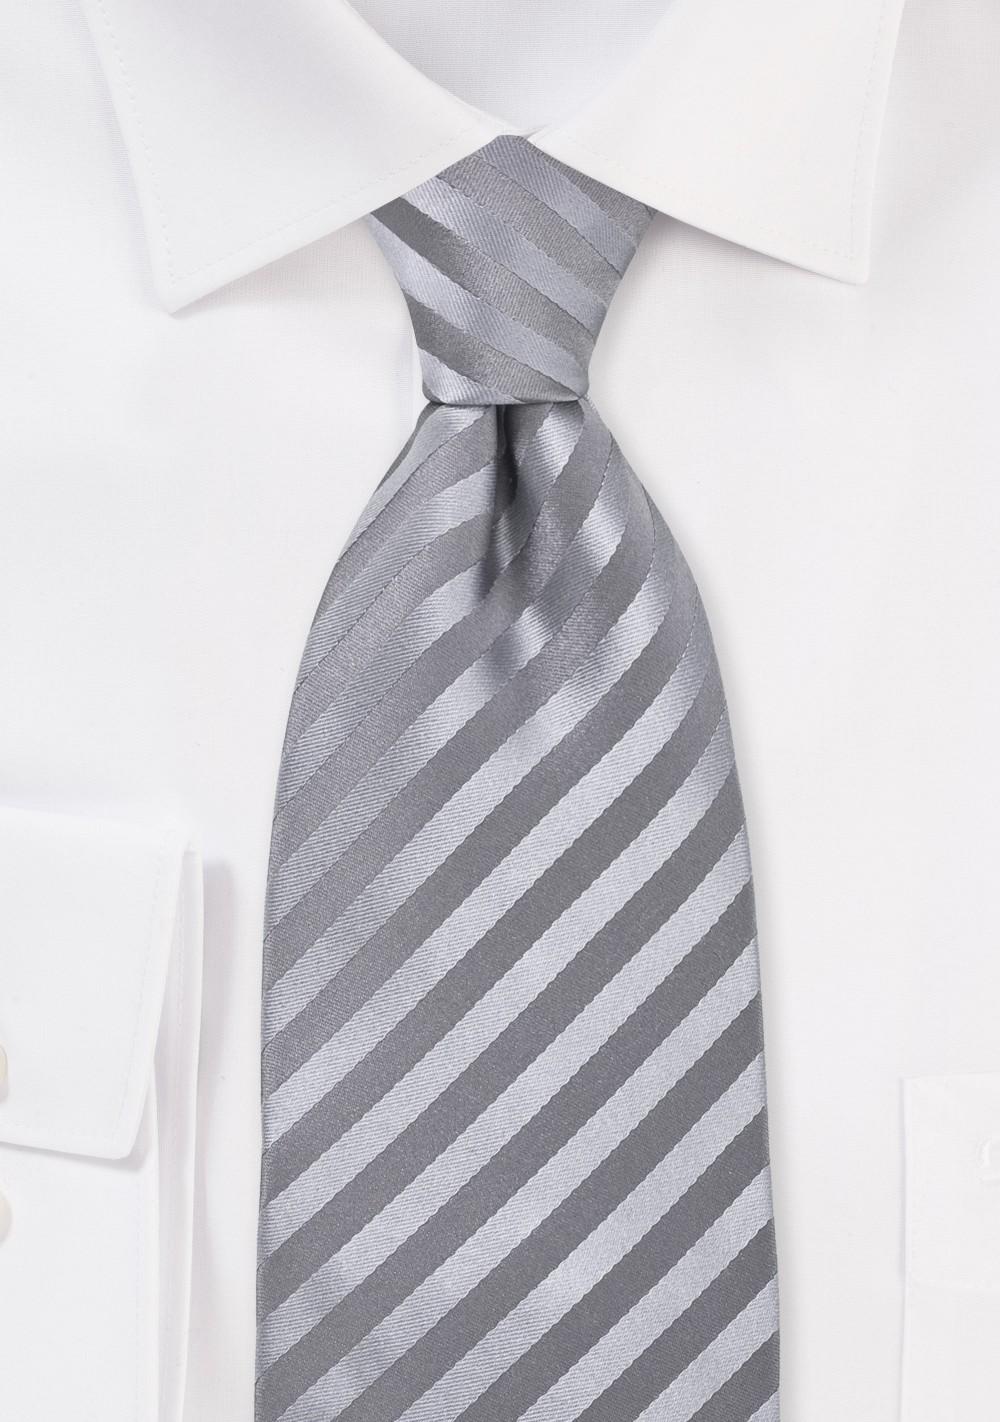 Silver-Gray Silk Tie in Extra Long Length